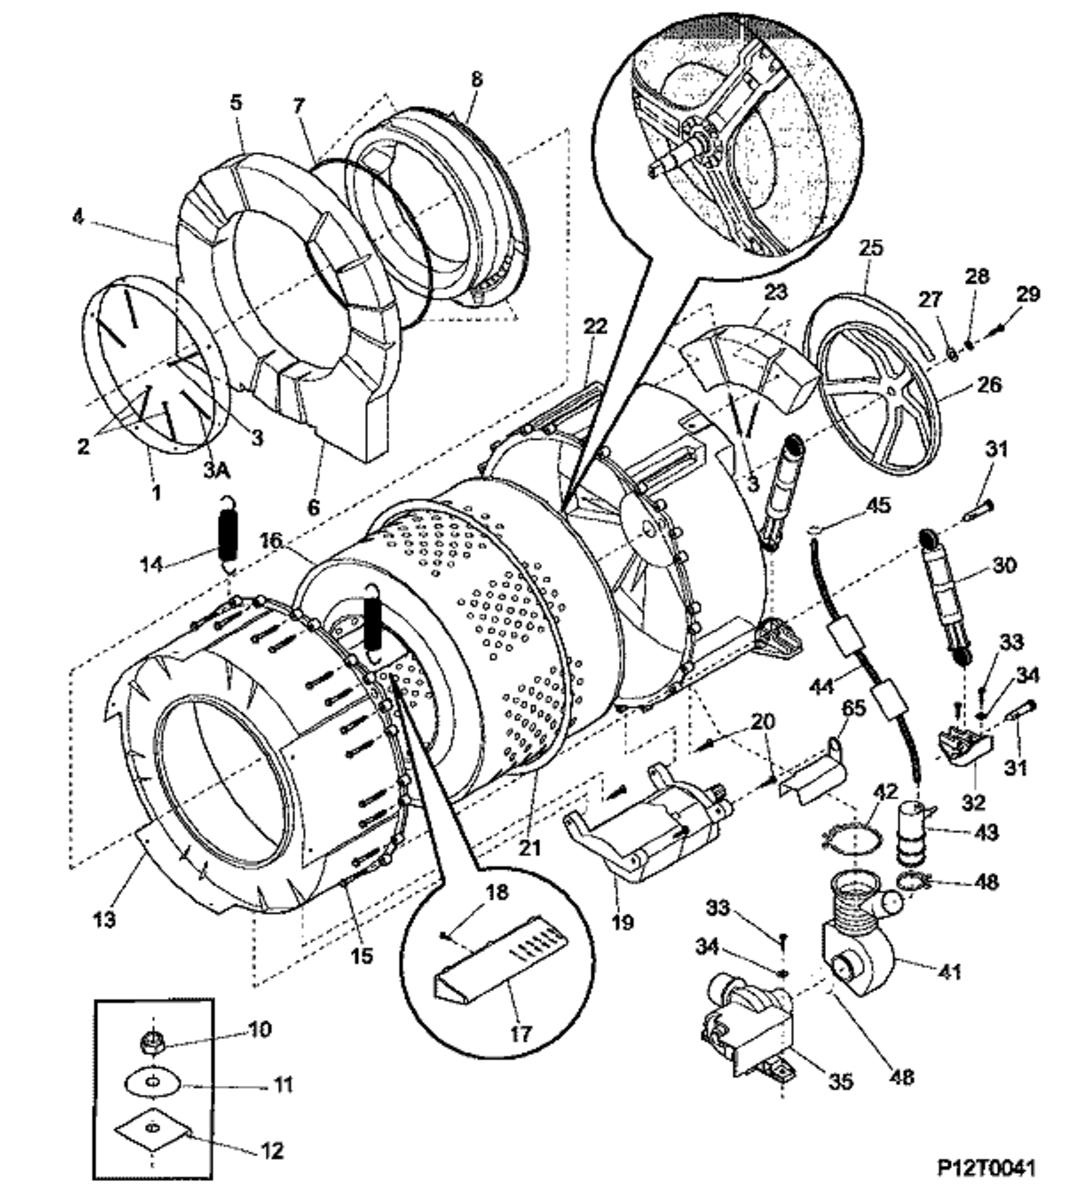 Maytag Washer Motor Ledningsdiagram